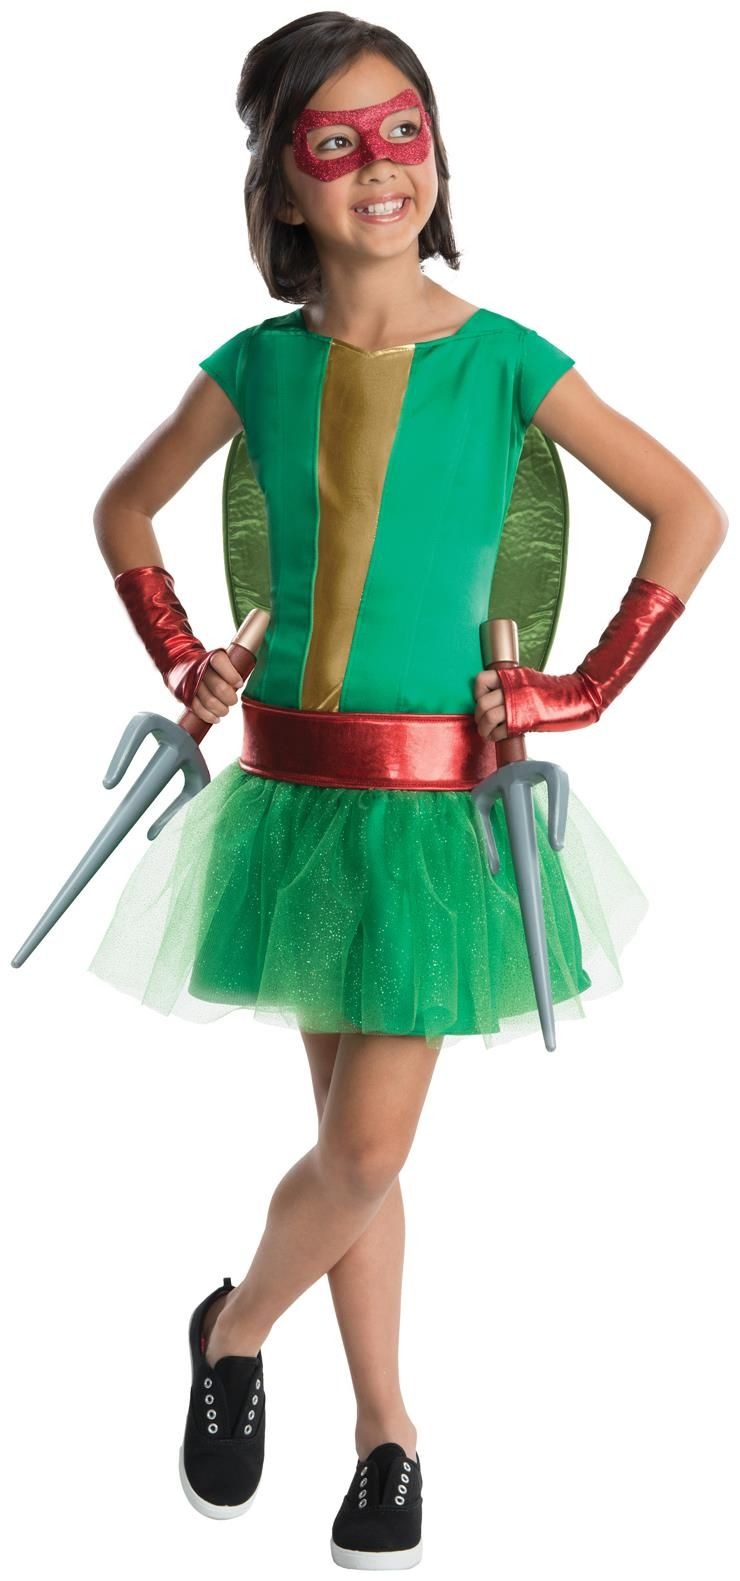 TMNT Deluxe Raphael Girl Tutu Costume